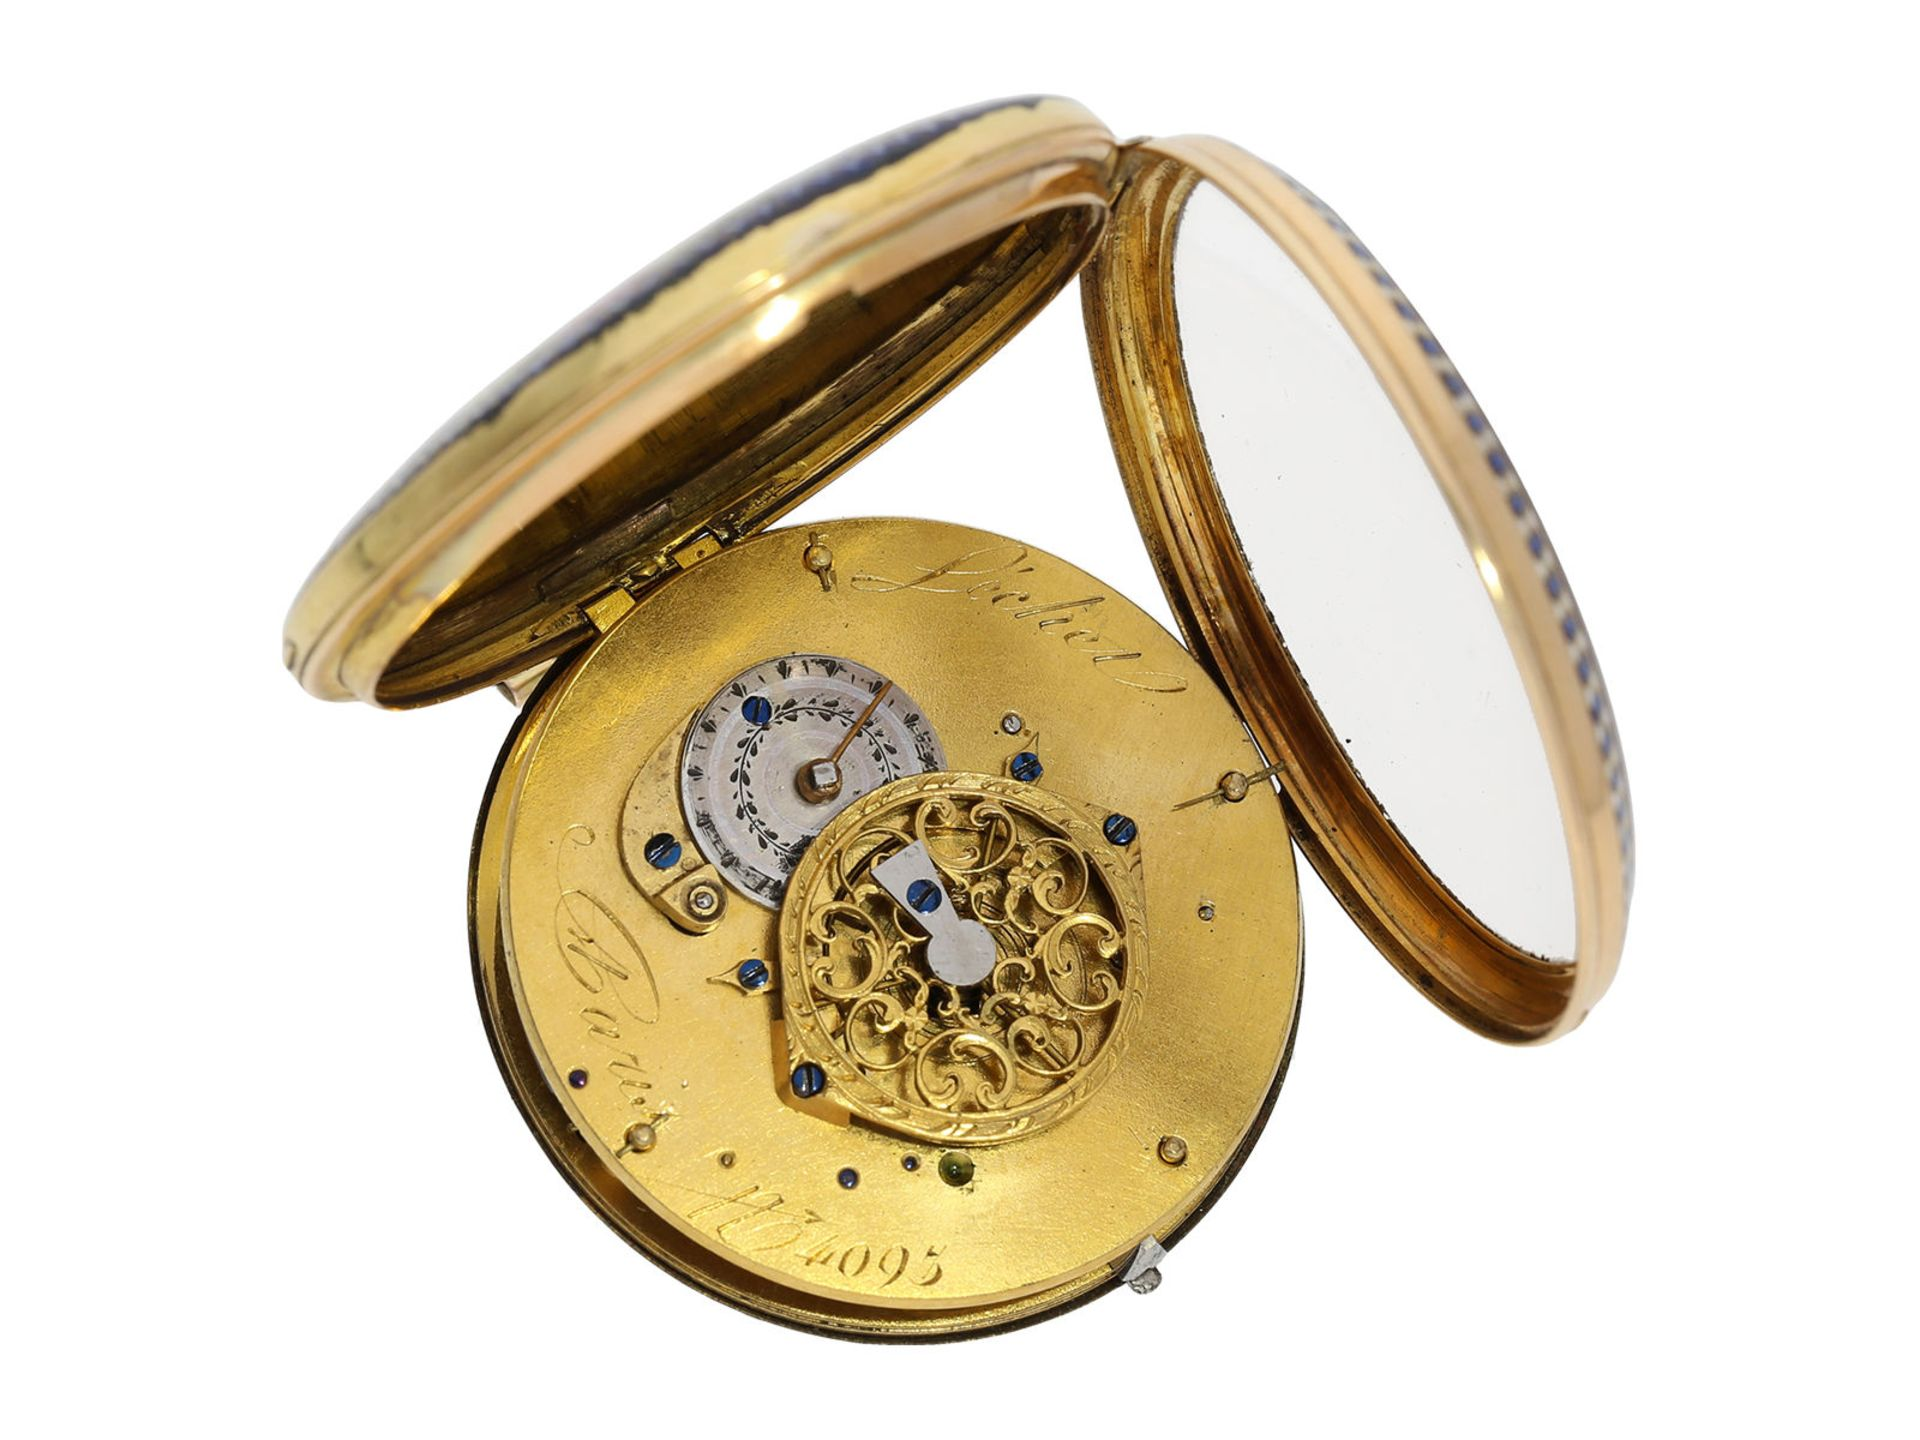 Pocket watch: large gold/ enamel pocket watch, Lechet a Paris, ca. 1795 - Bild 3 aus 4